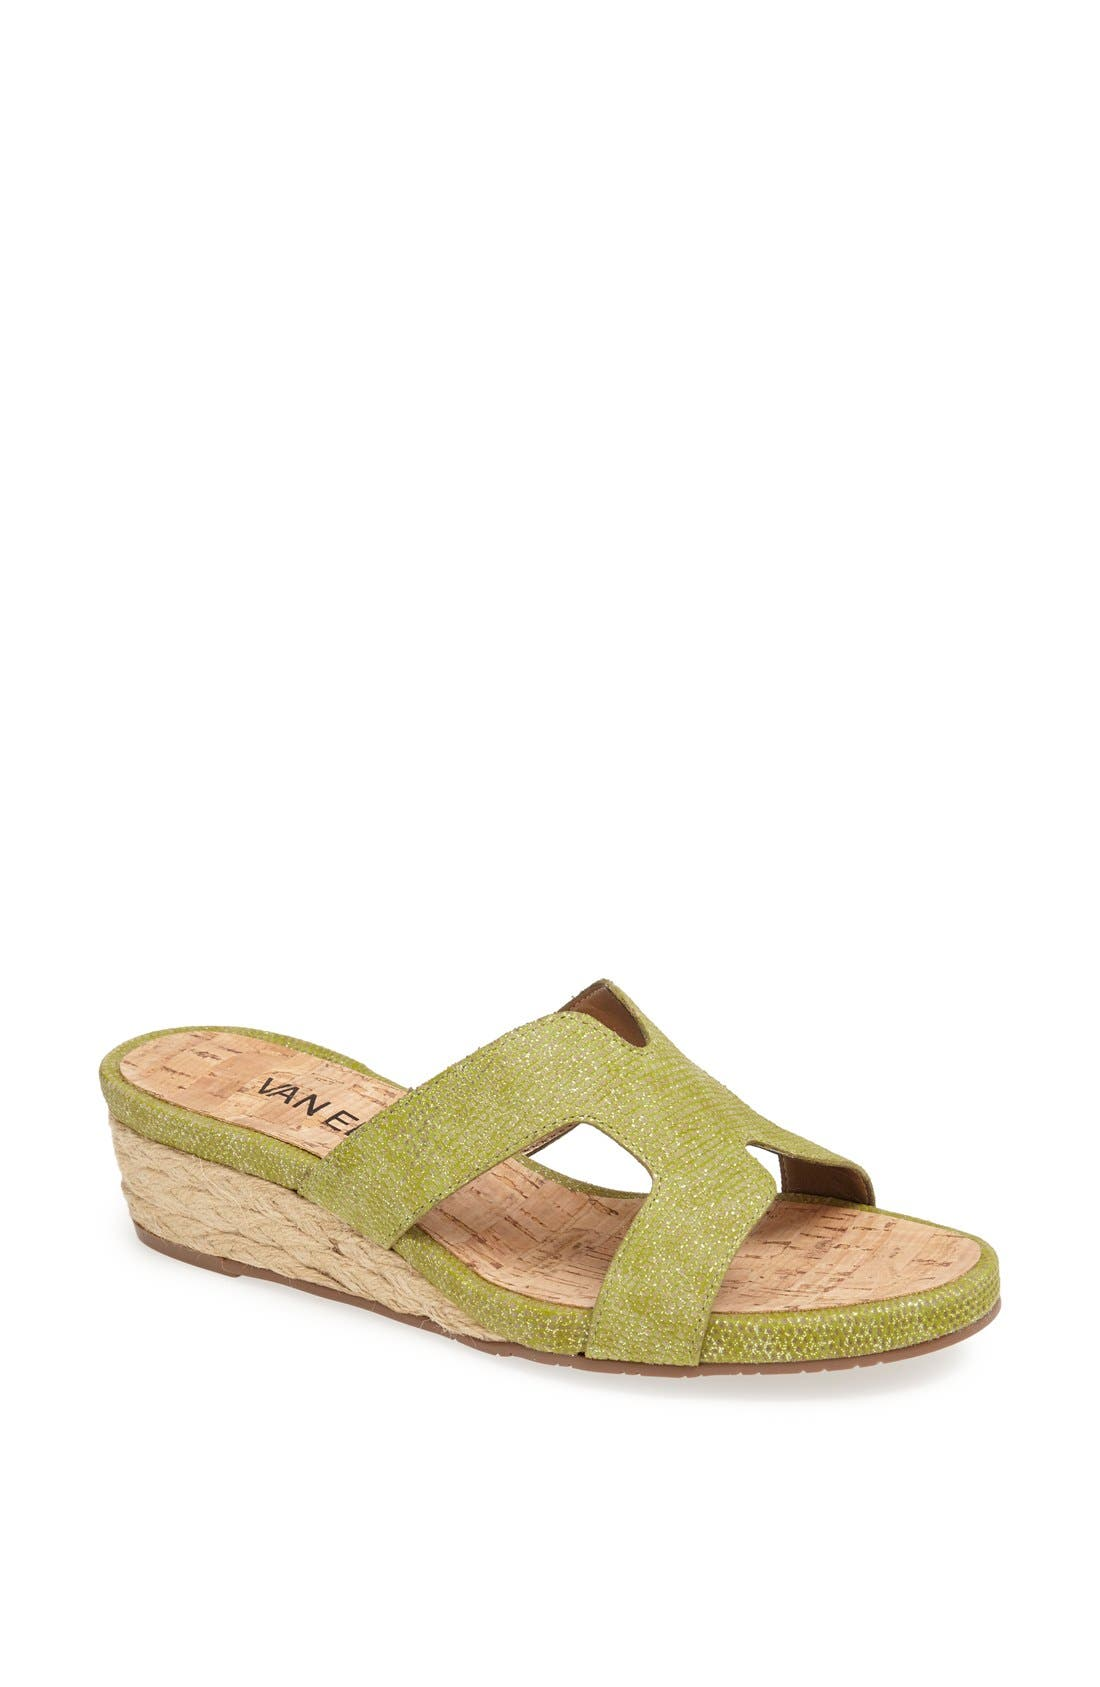 Main Image - VANELi 'Kallita' Sandal